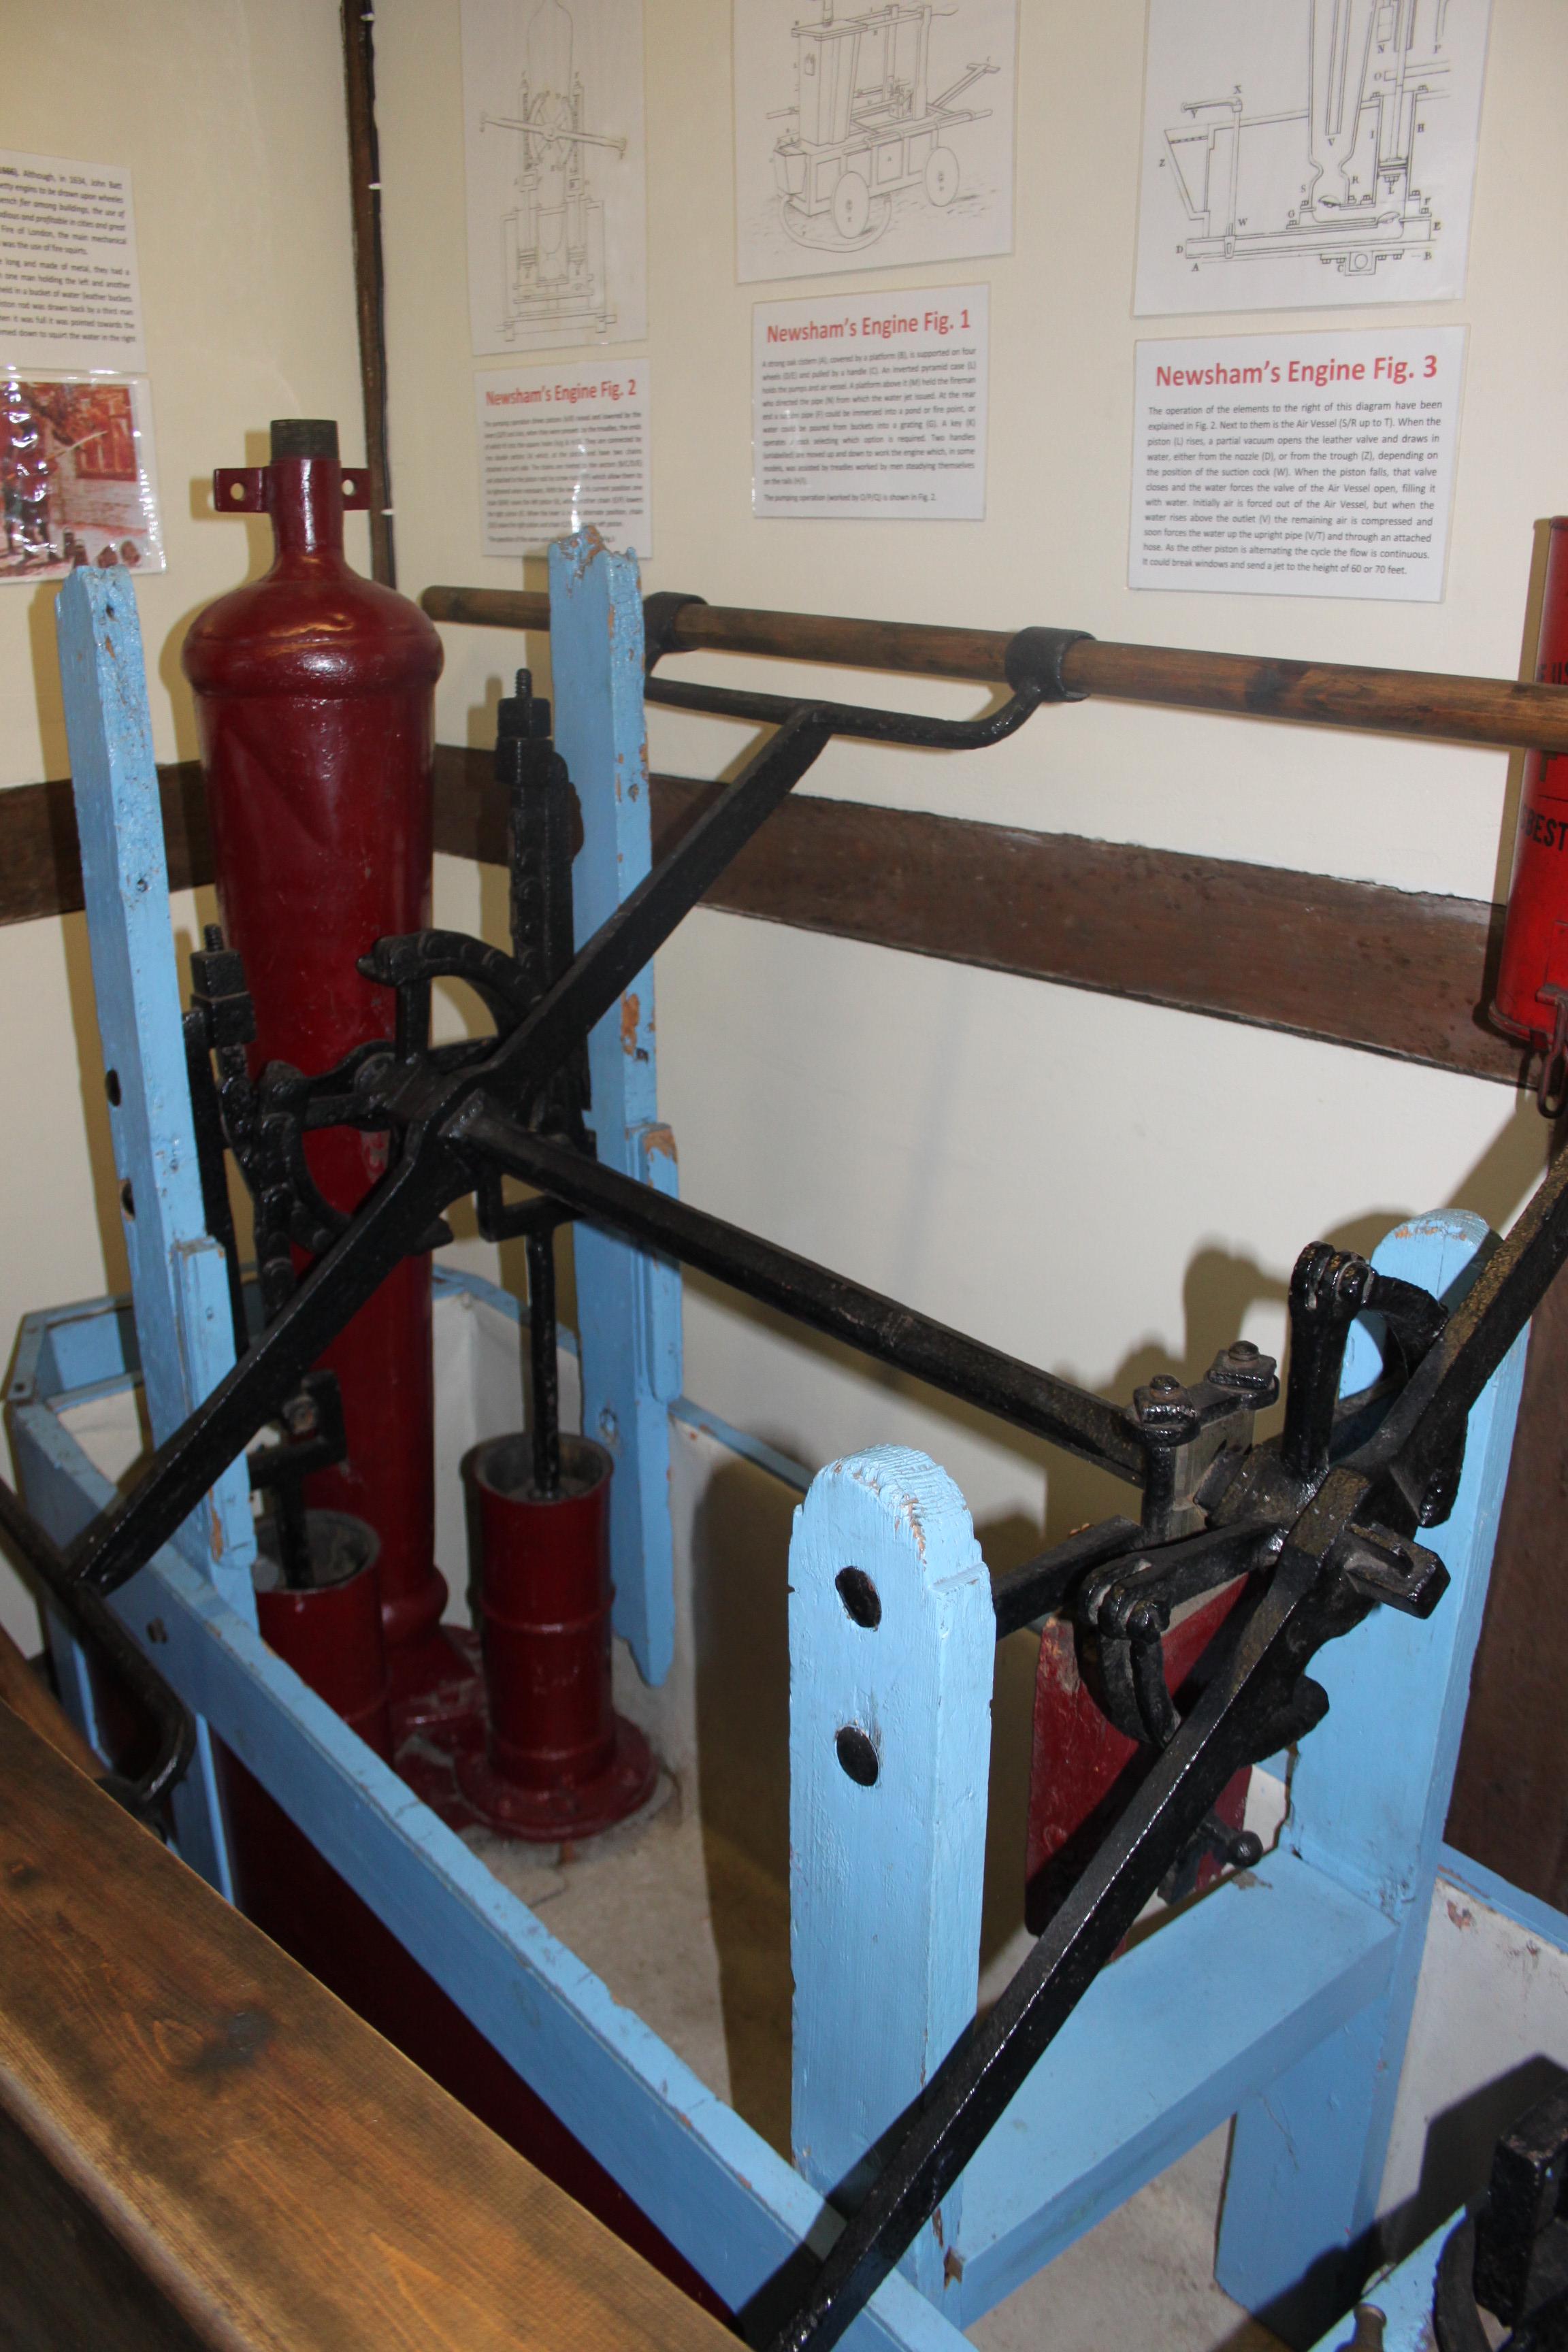 Fileking Johns Hunting Lodge Axbridge Old Fire Engine Diagram